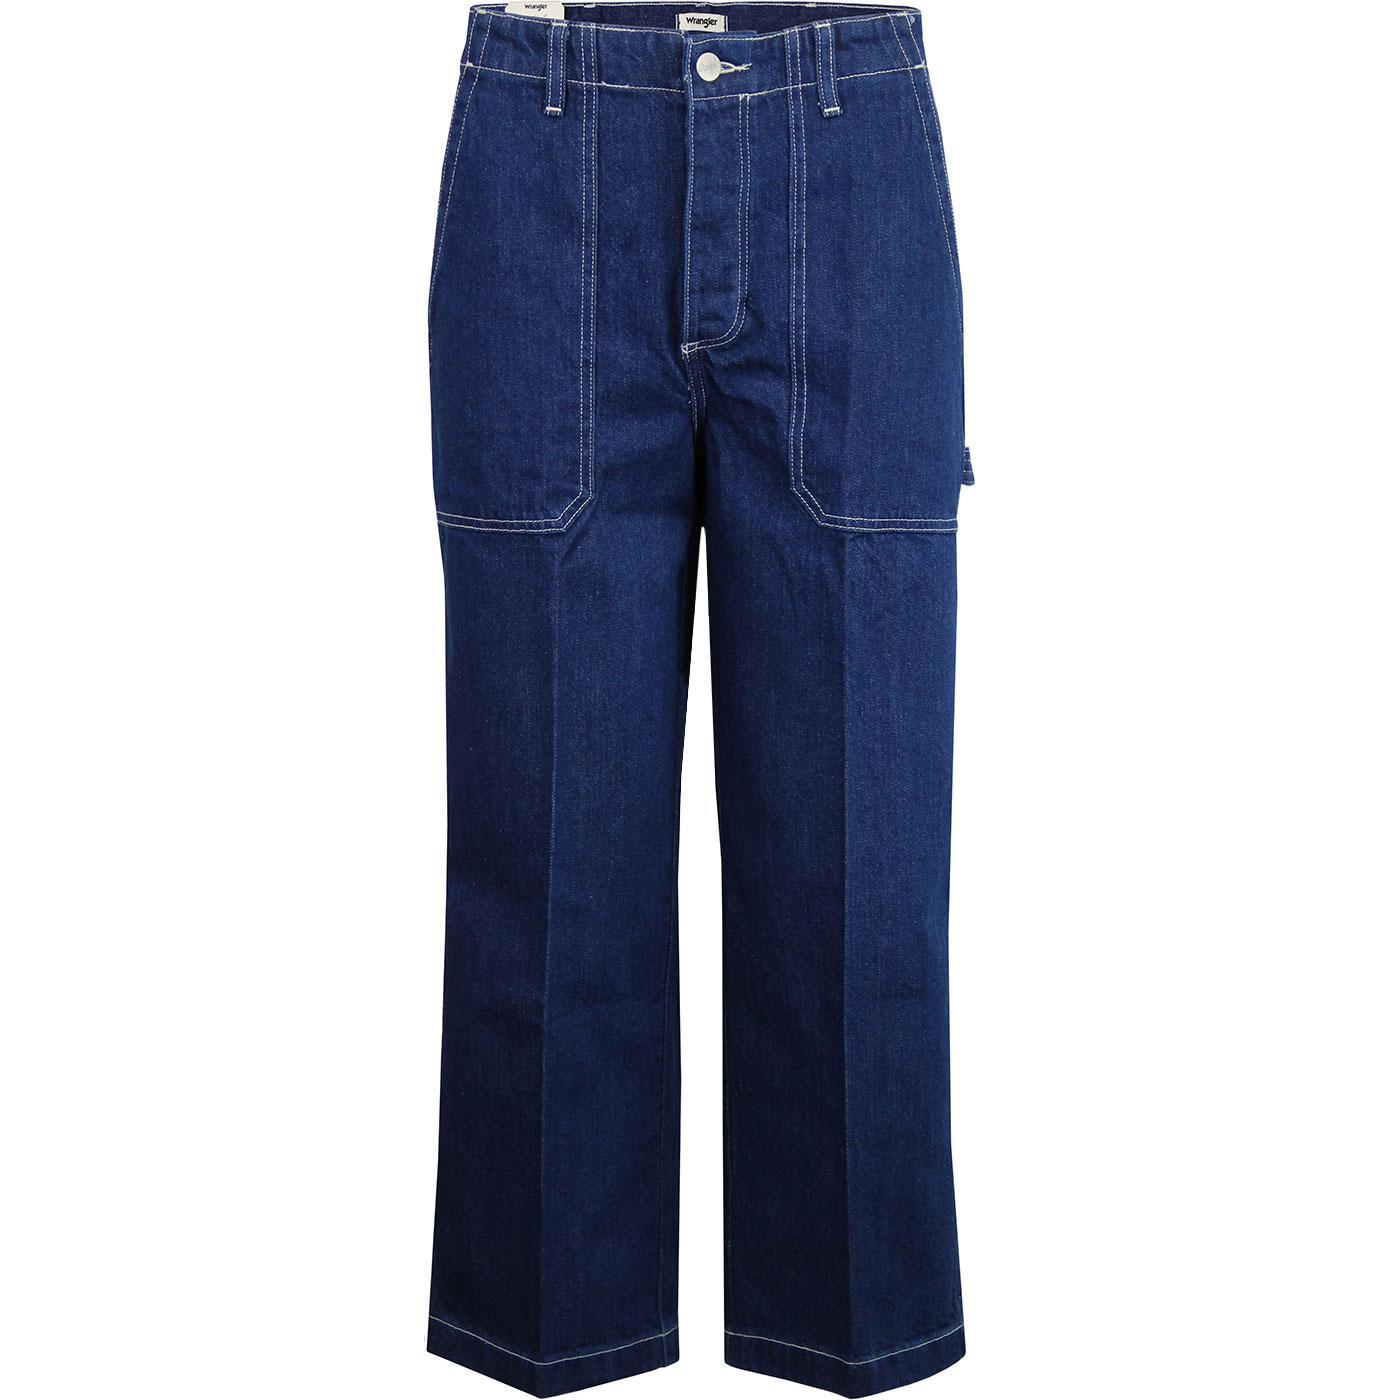 Carpenter Pants WRANGLER Retro 70s Cropped Jeans